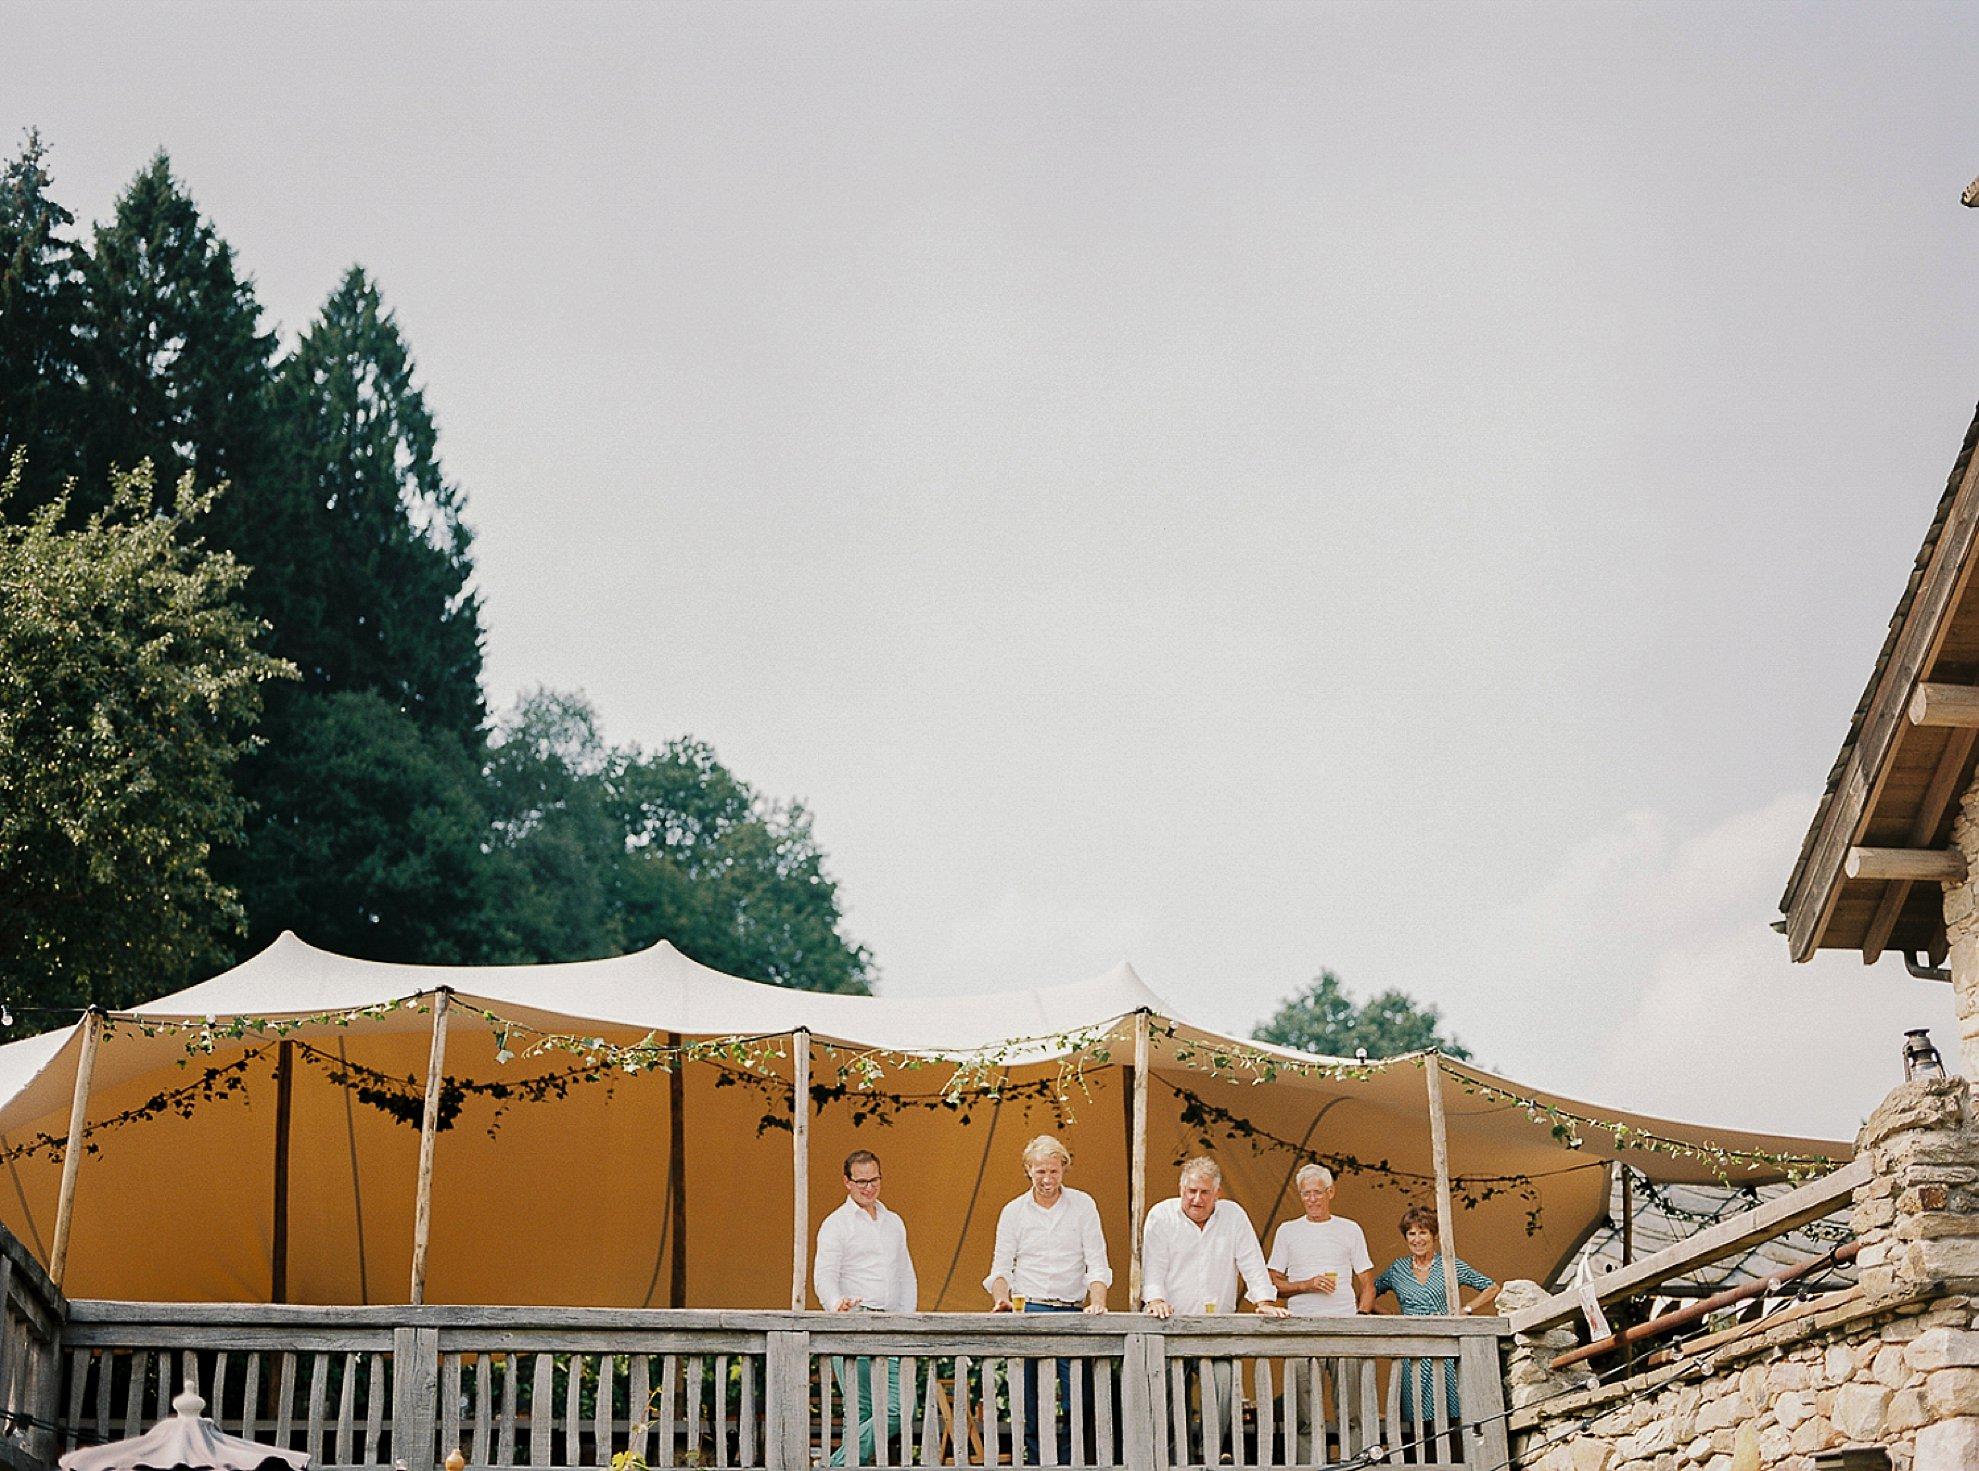 Amanda-Drost-Fotografie-Belgie-Photography-Wedding_0017.jpg